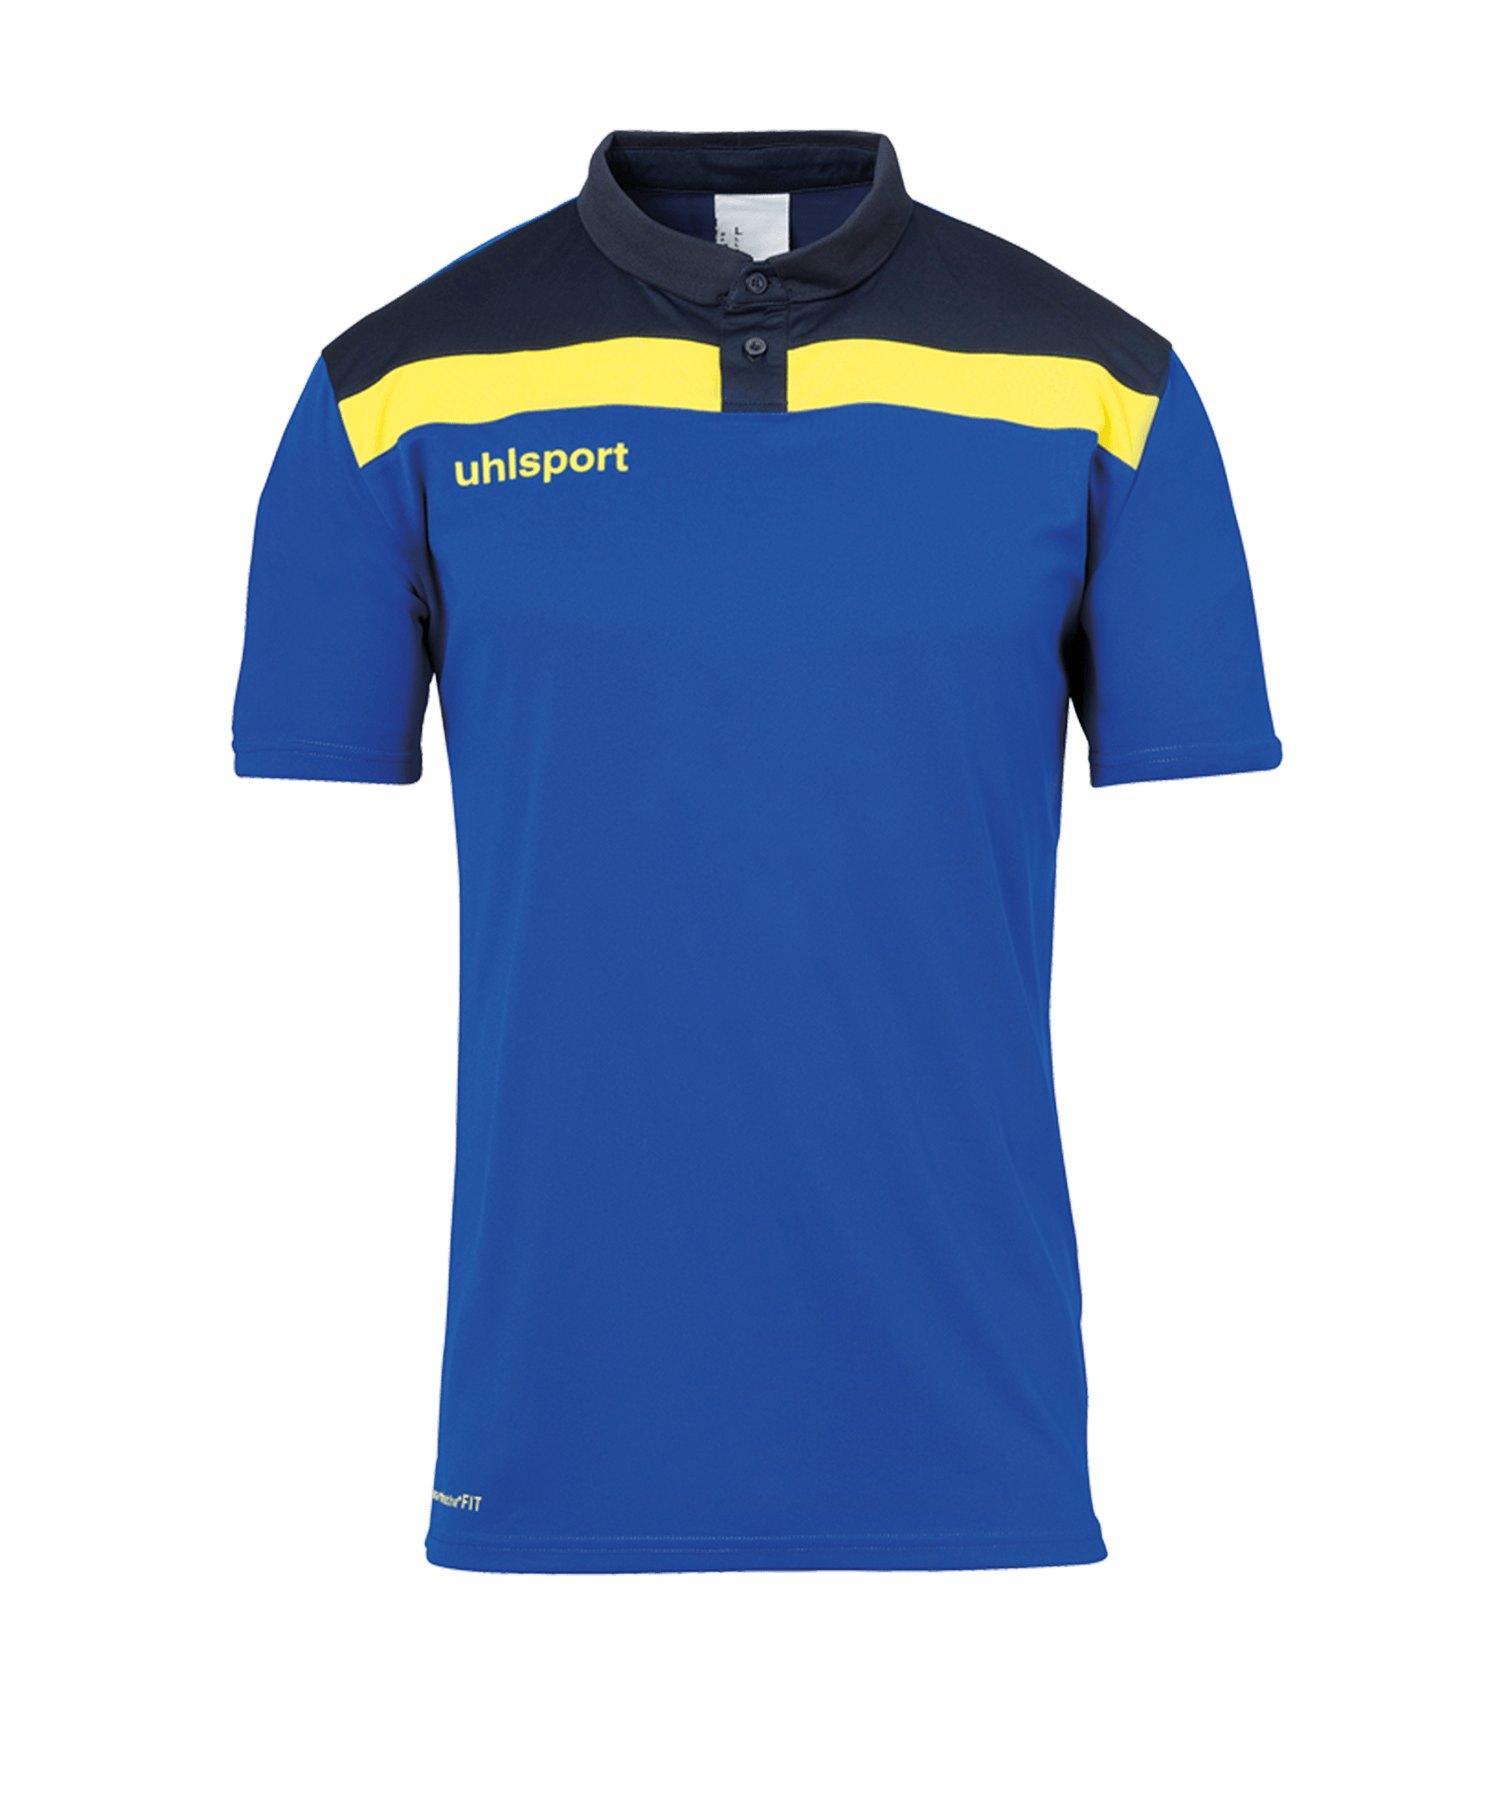 Uhlsport Offense 23 Poloshirt Kids Blau F14 - blau